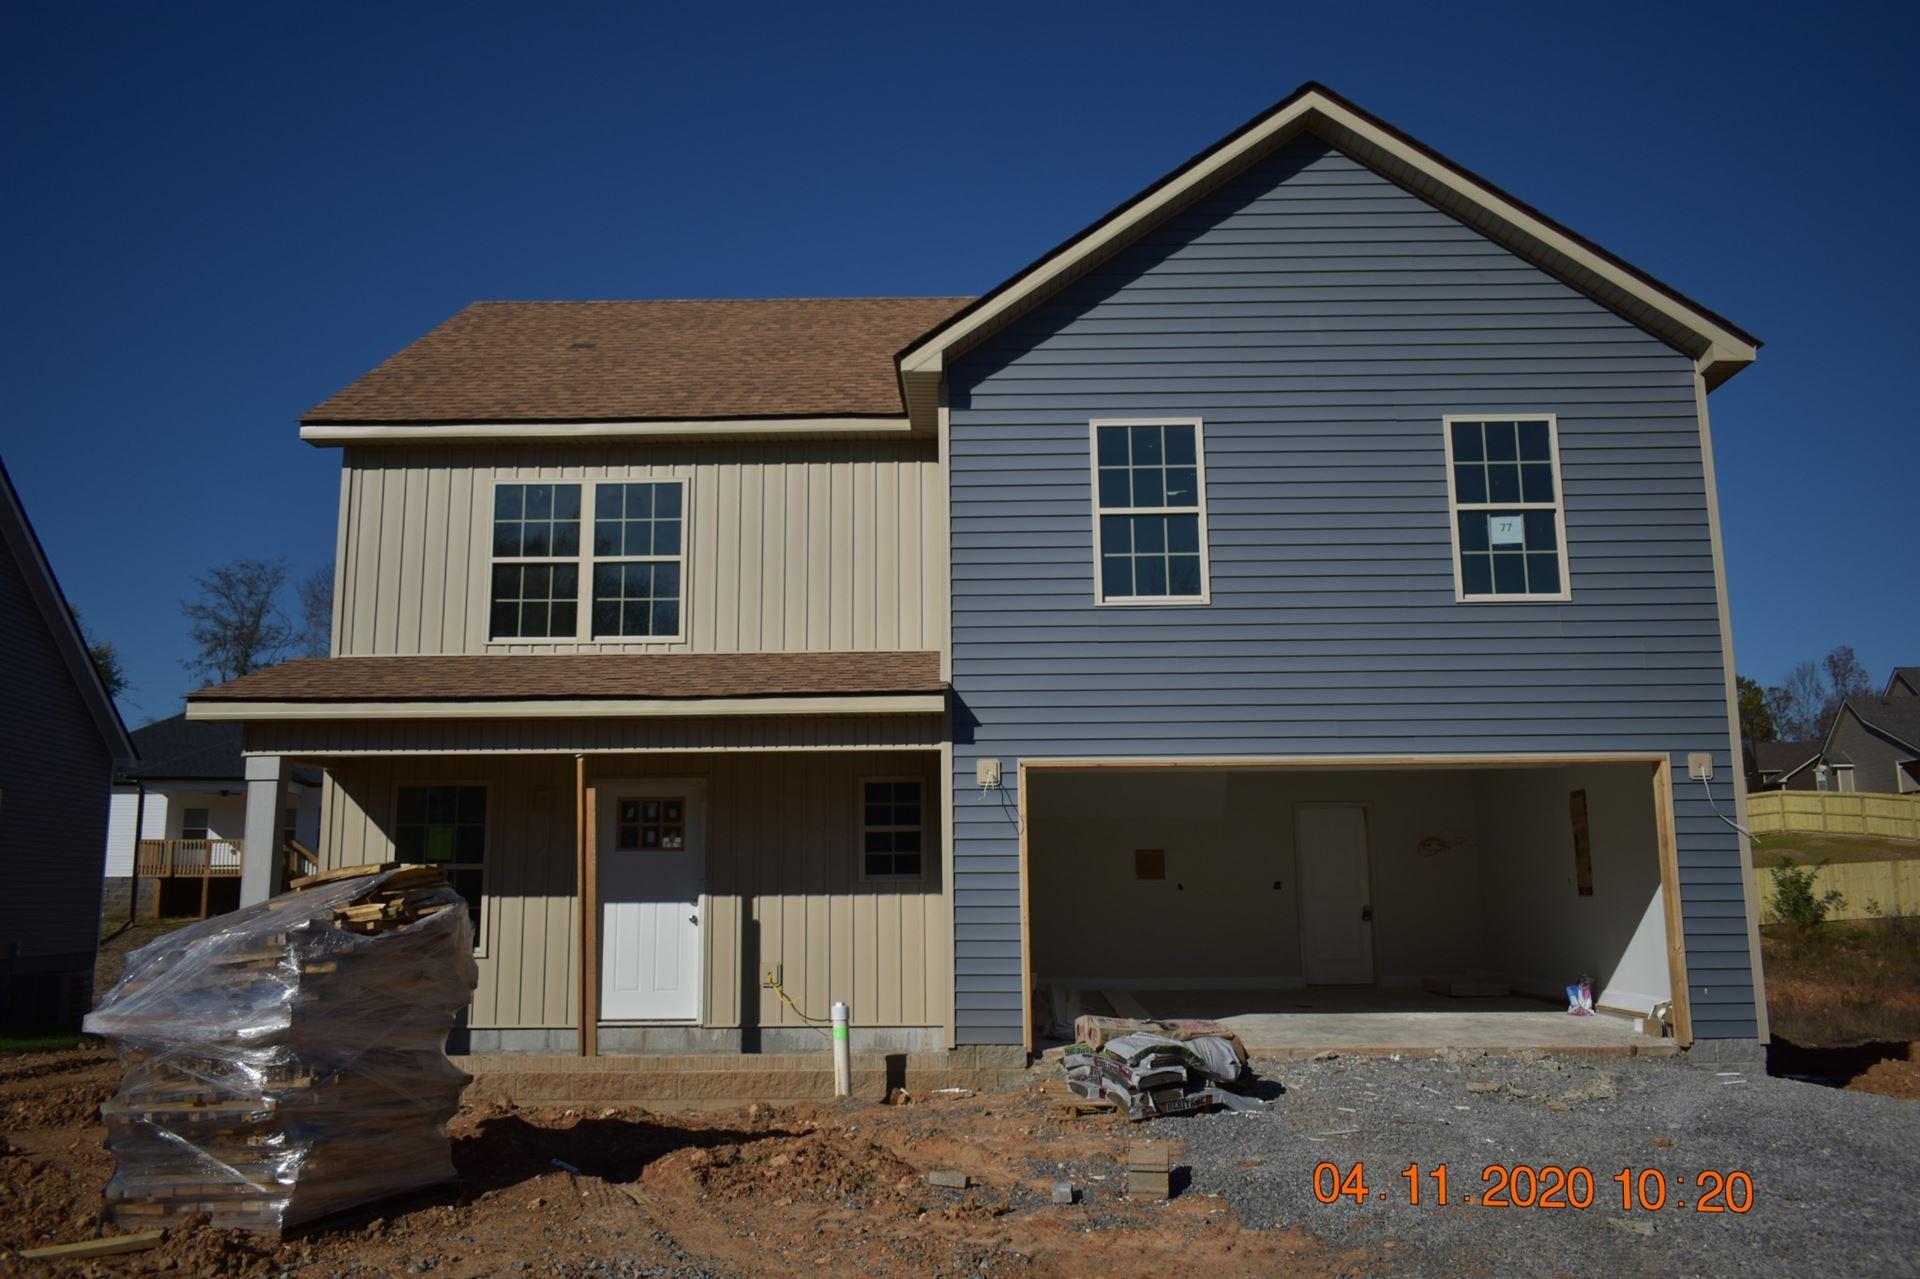 77 Chestnut Hill, Clarksville, TN 37042 - MLS#: 2184738